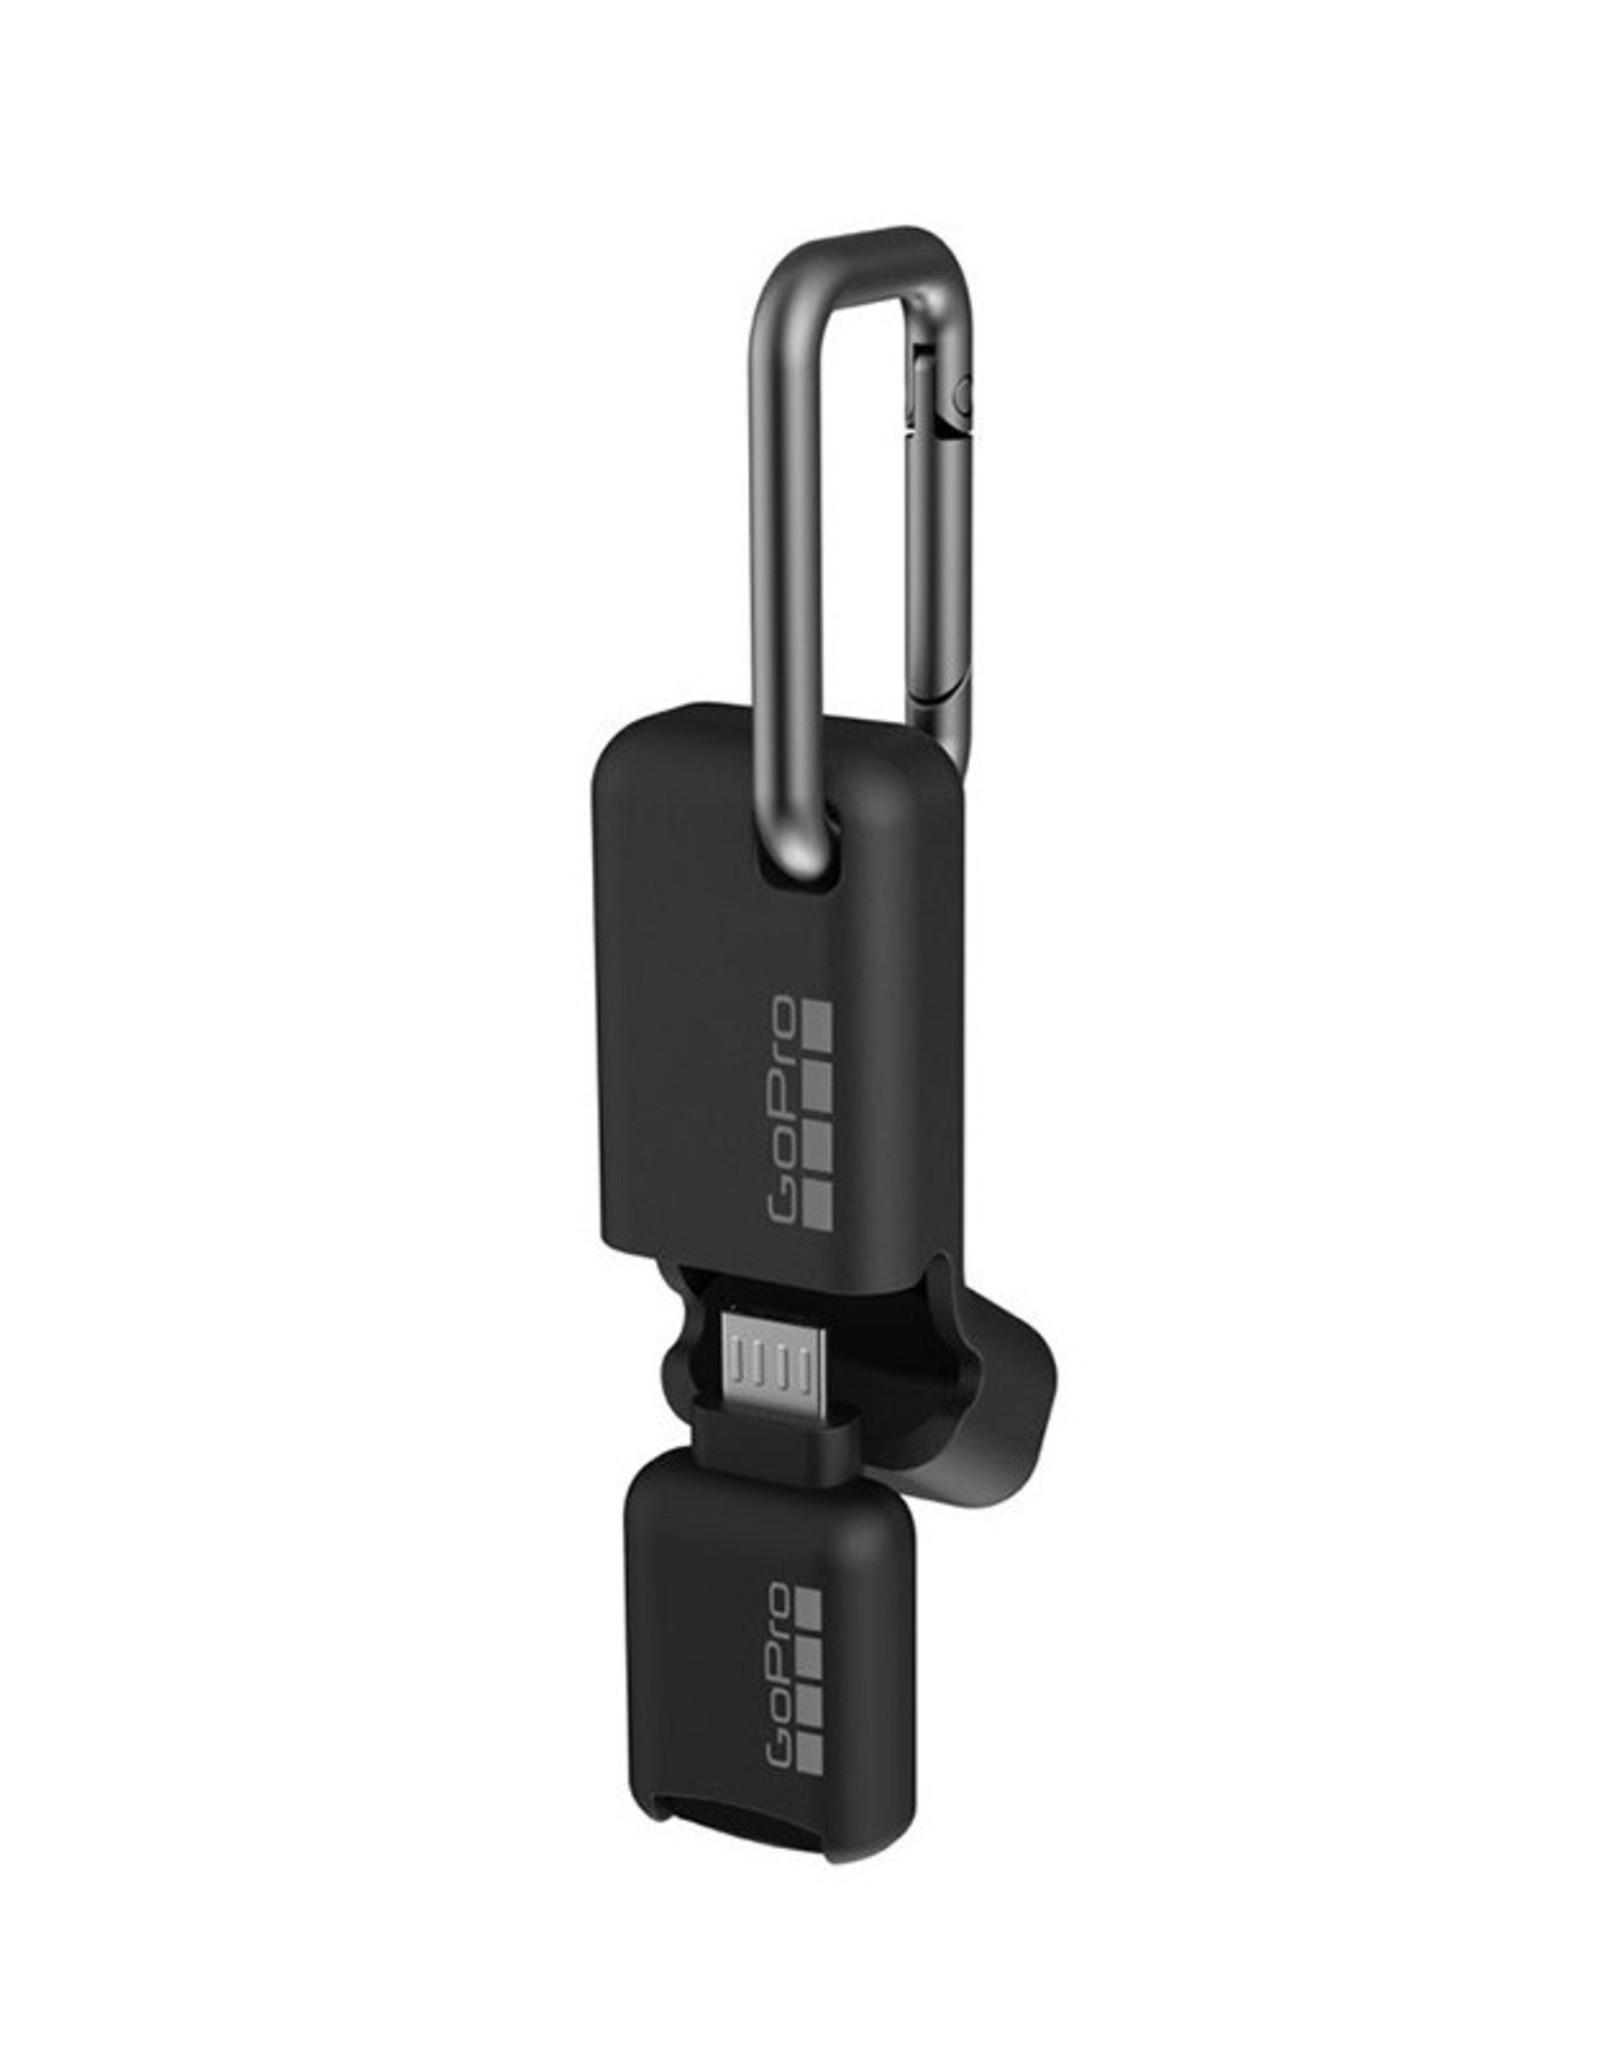 GoPro Quik Key (Micro-USB)